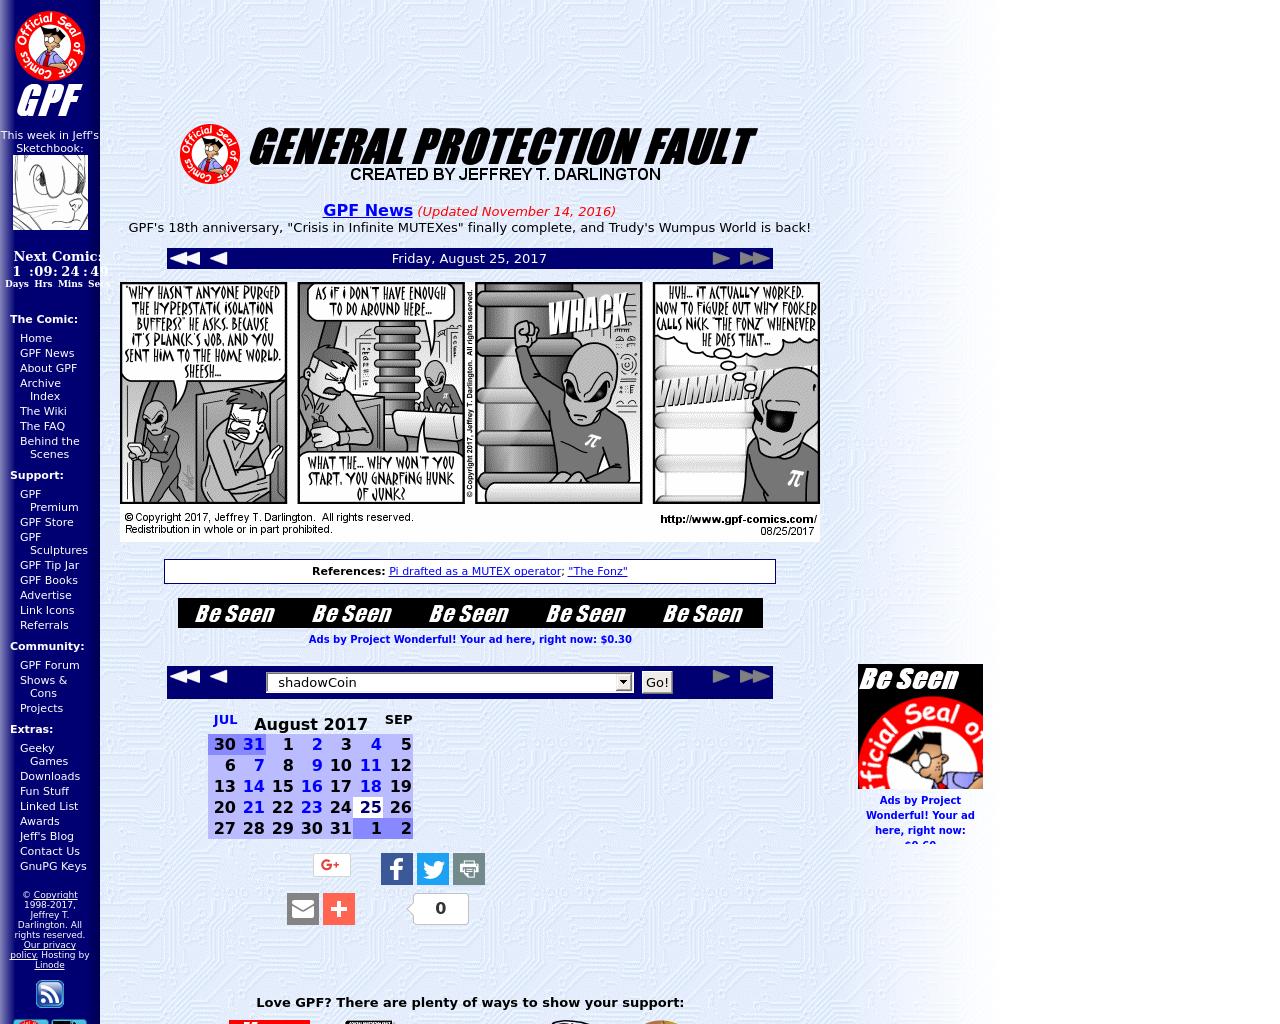 GPF-Comics-Advertising-Reviews-Pricing